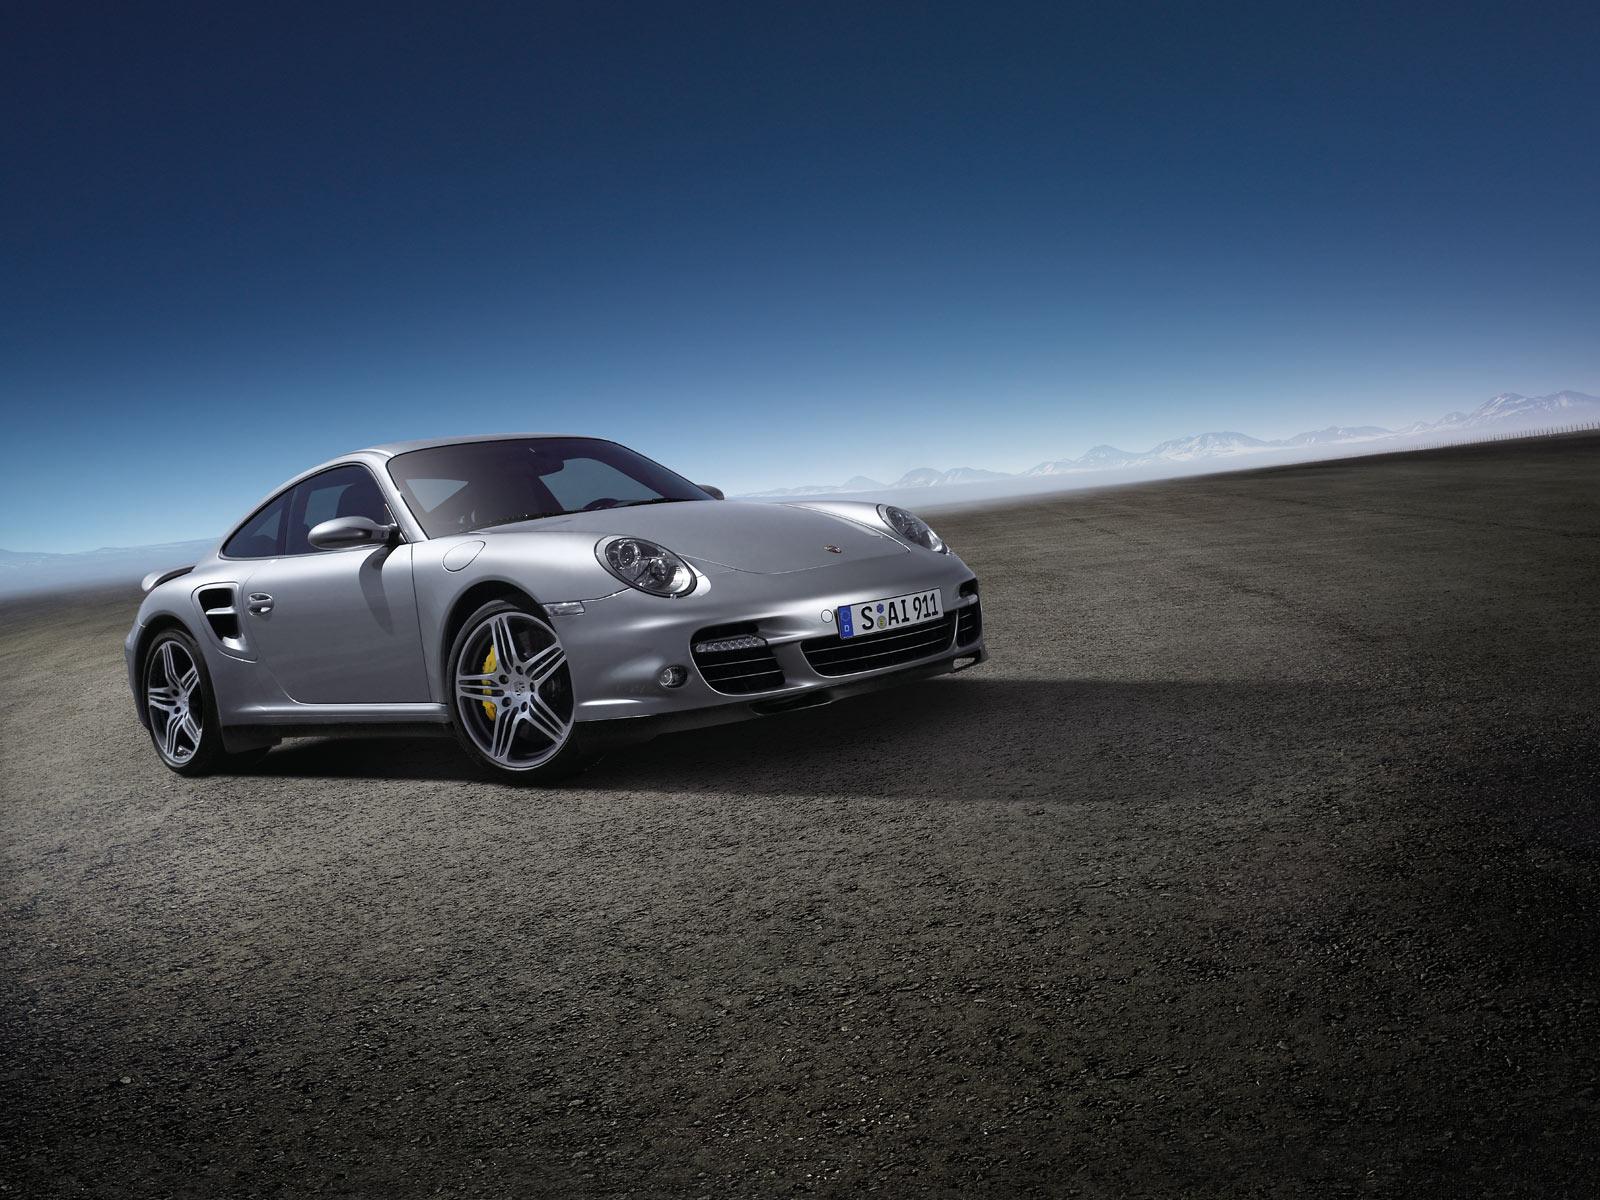 Porsche 911 Turbo Wallpapers 1600x1200 1600x1200